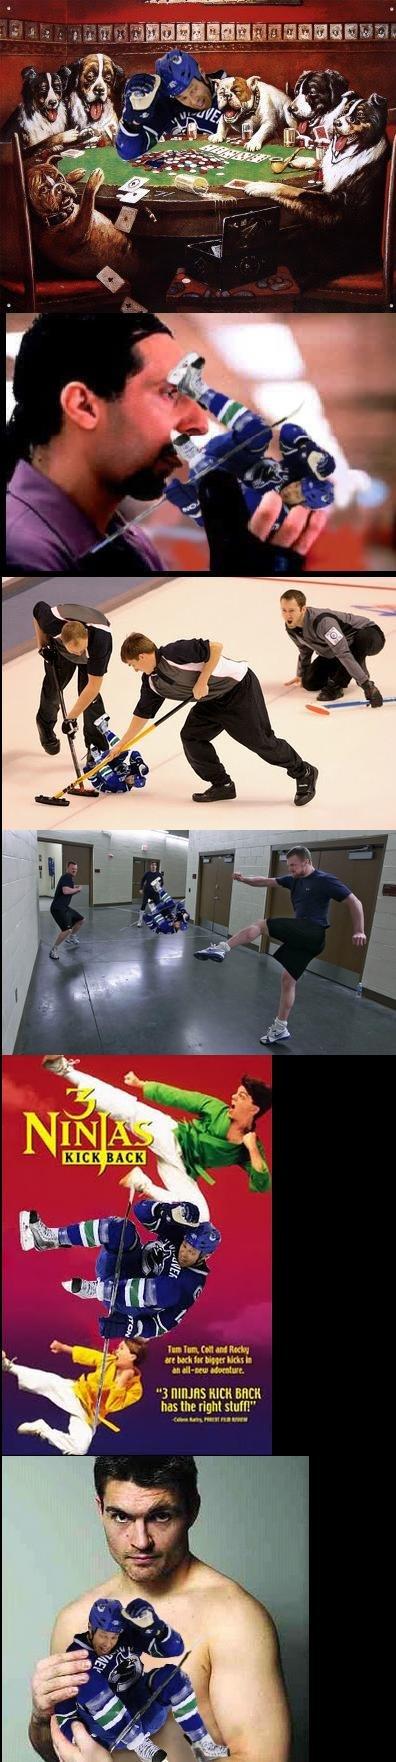 Photoshop fun with Raffi Torres Part 2. More of Raffi Torres bowling ball Part 1: funnyjunk.com/funny_pictures/2028910/Photoshop+fun+with+Raffi+Torres/ Torres g